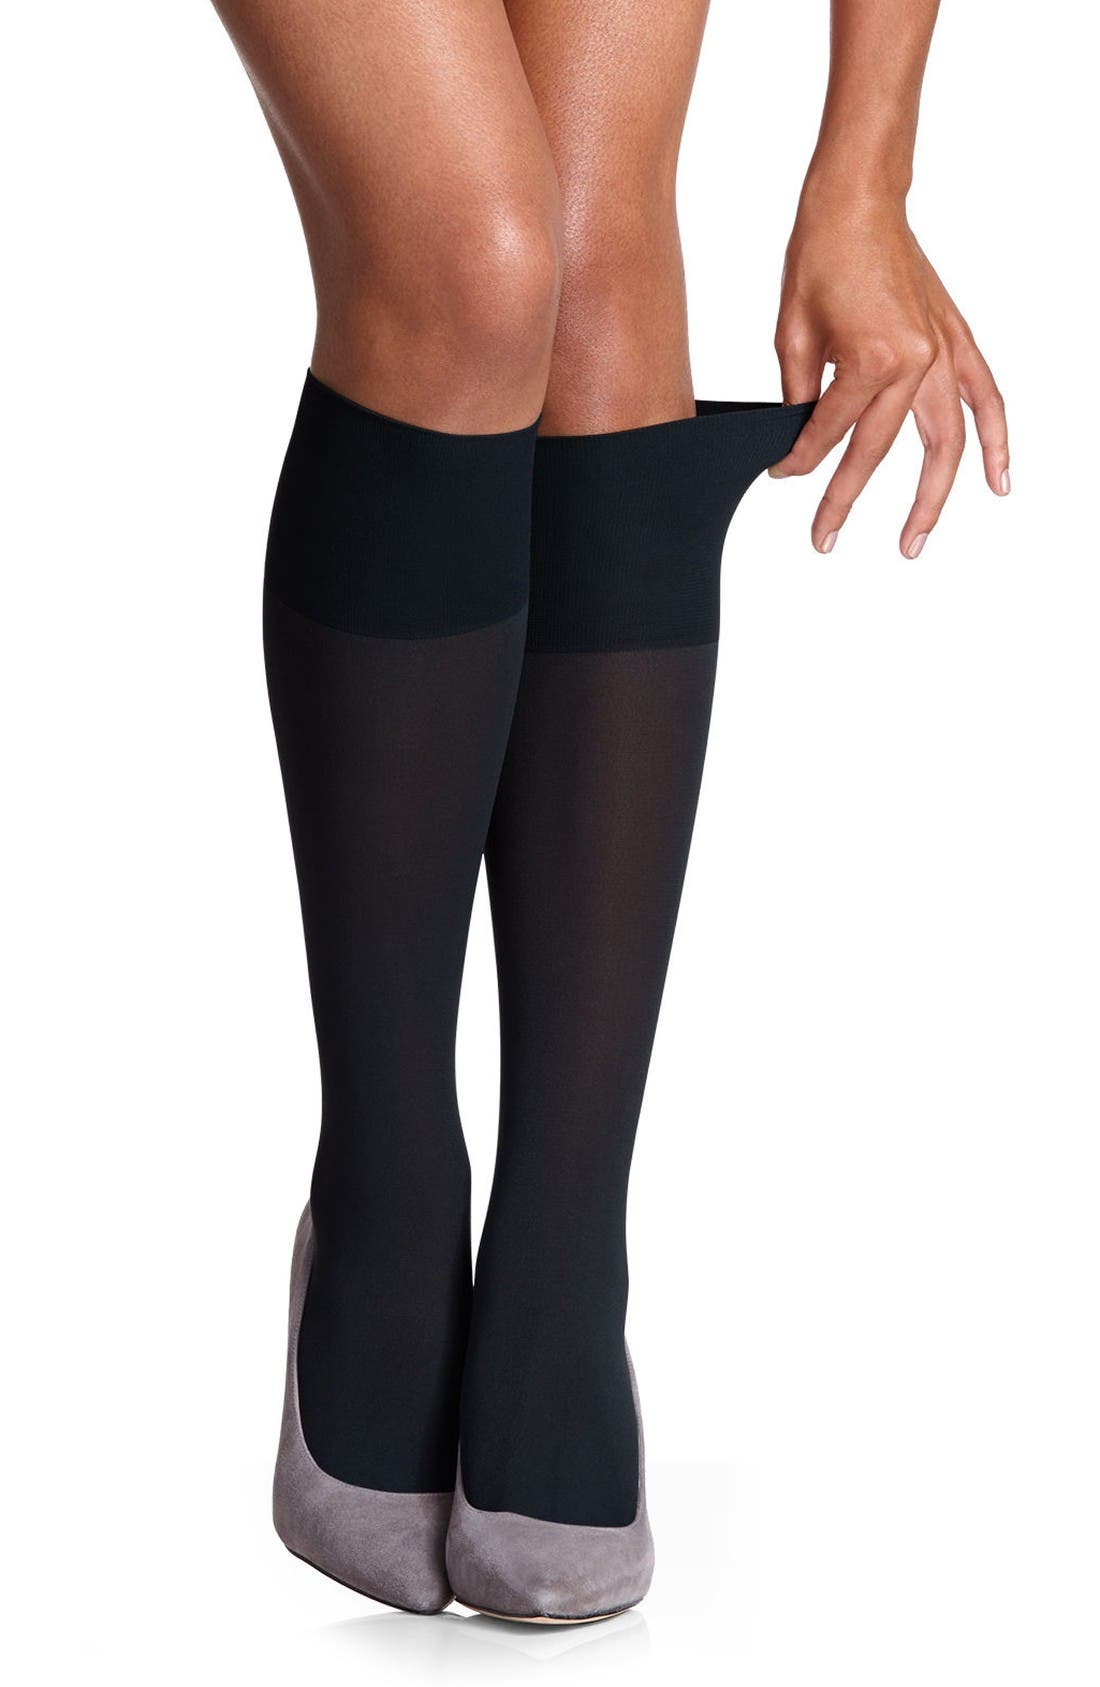 Berkshire Compression Knee High Socks